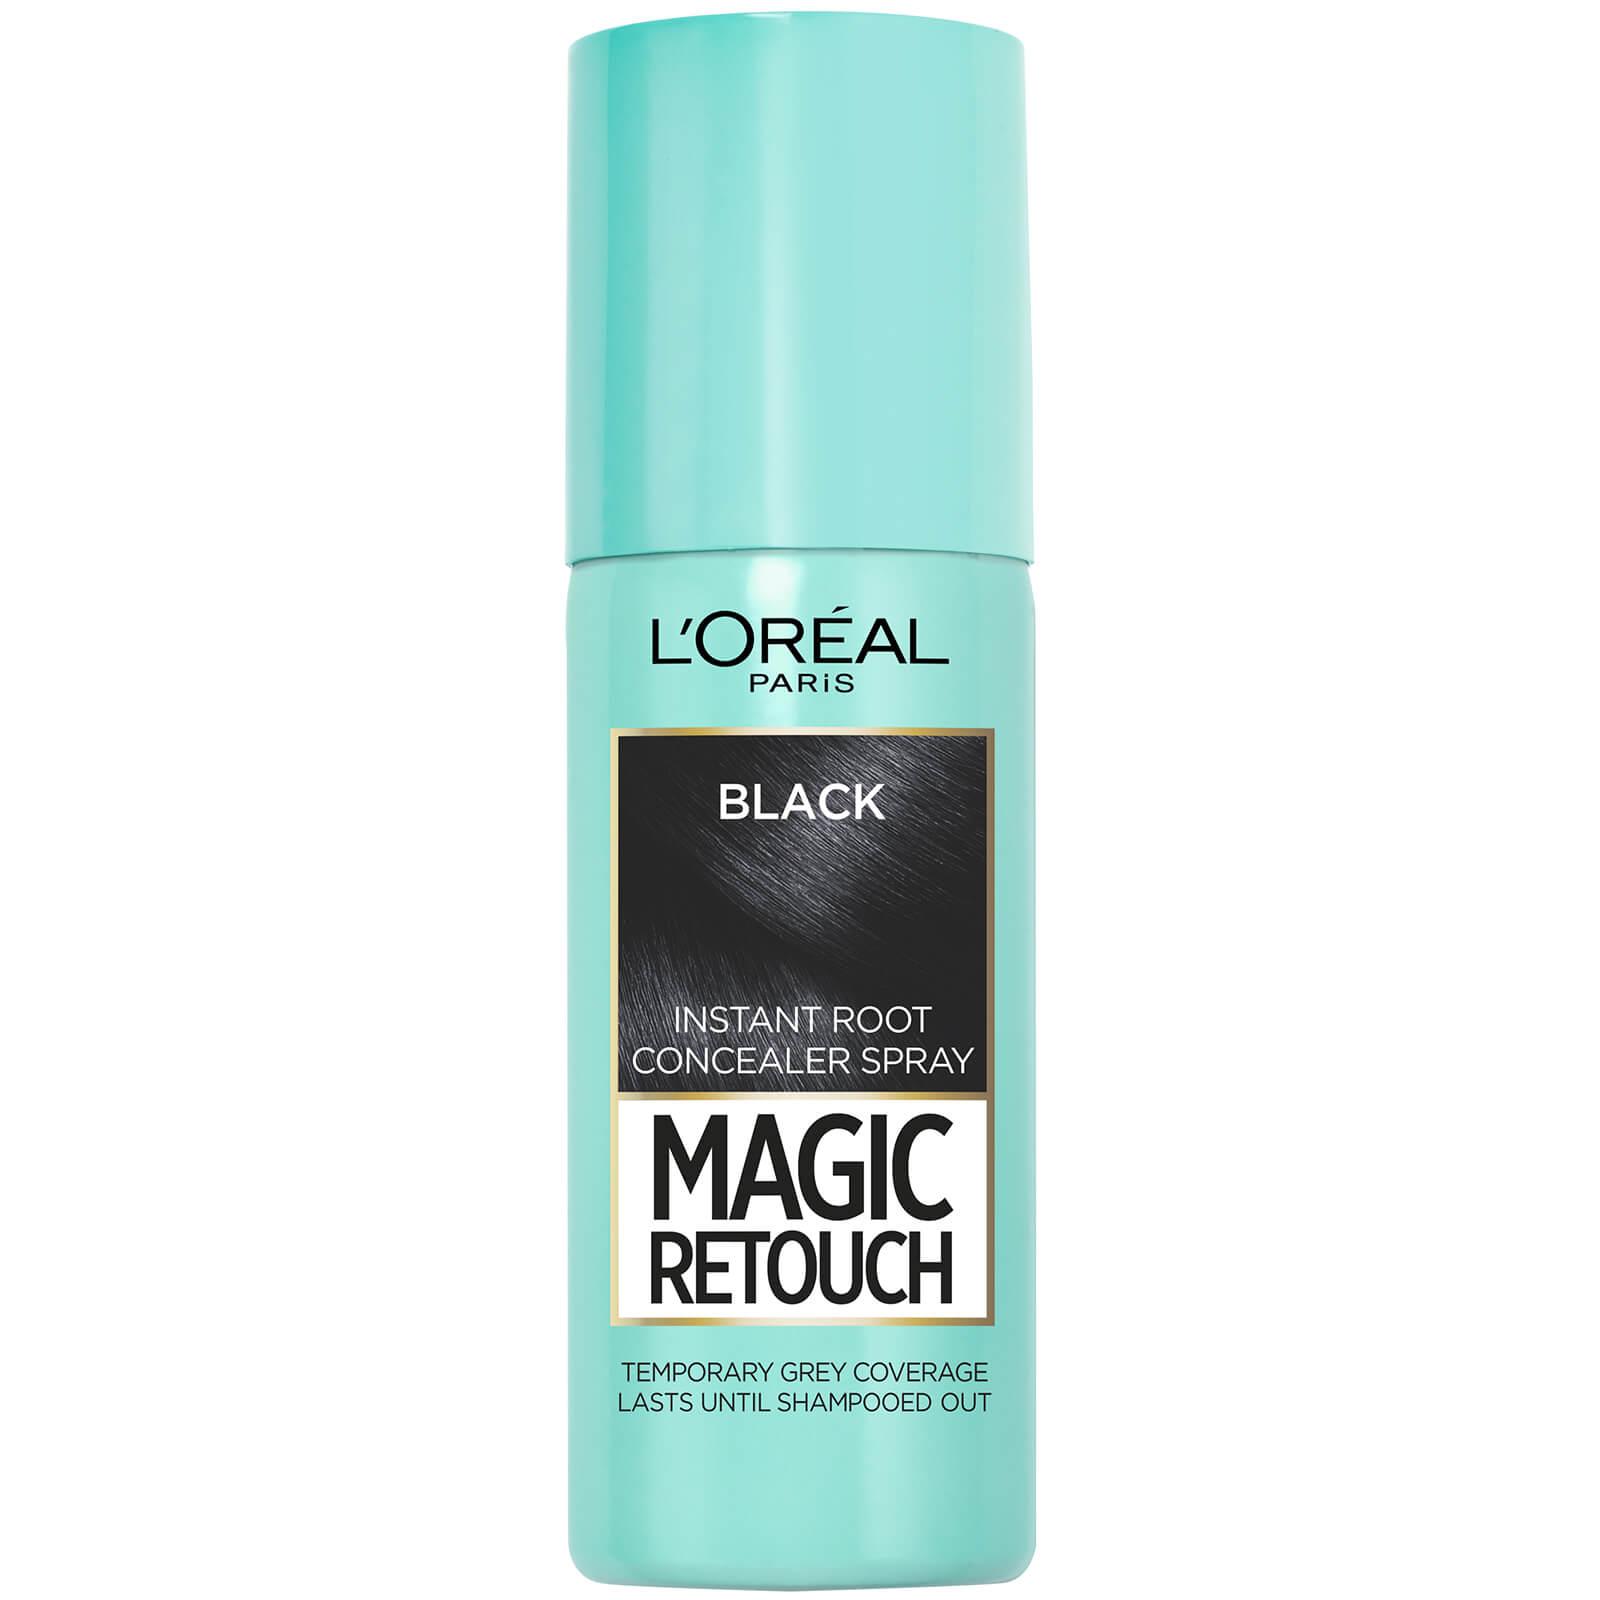 L'Oréal Paris Magic Retouch Temporary Instant Root Concealer Spray 75ml (Various Shades) - Black